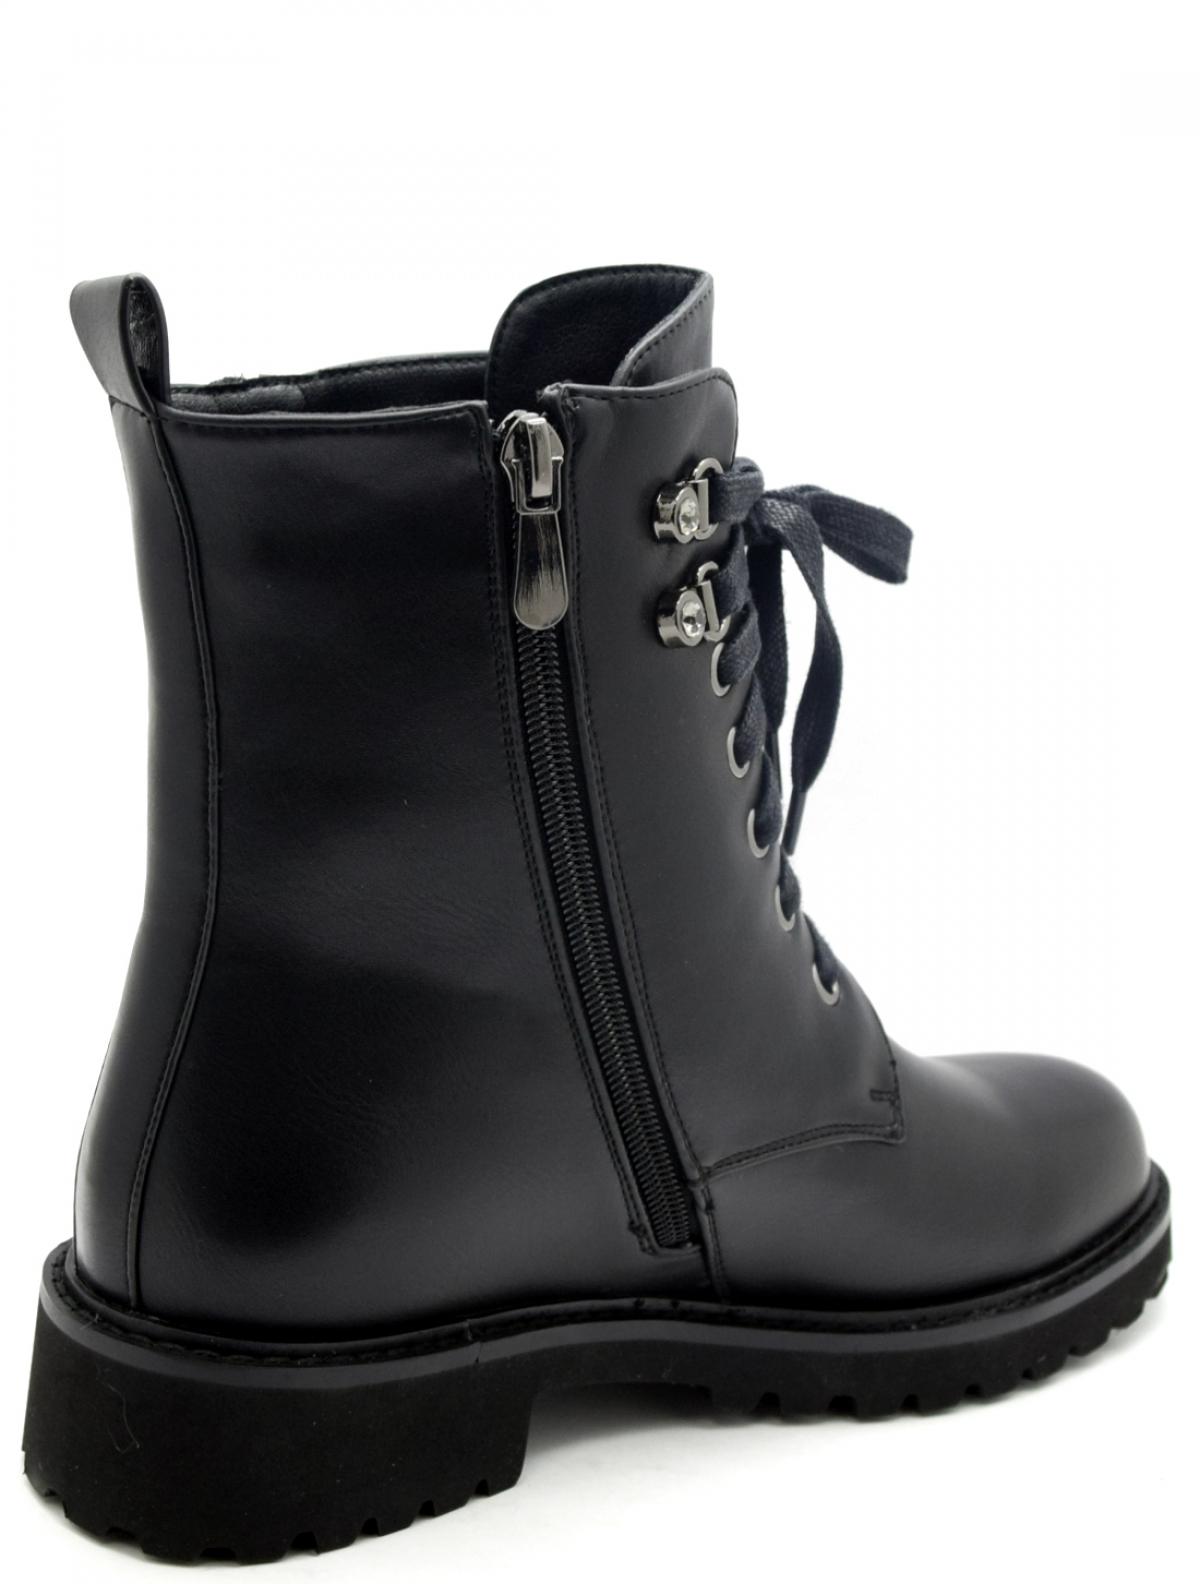 Admlis 6129 женские ботинки